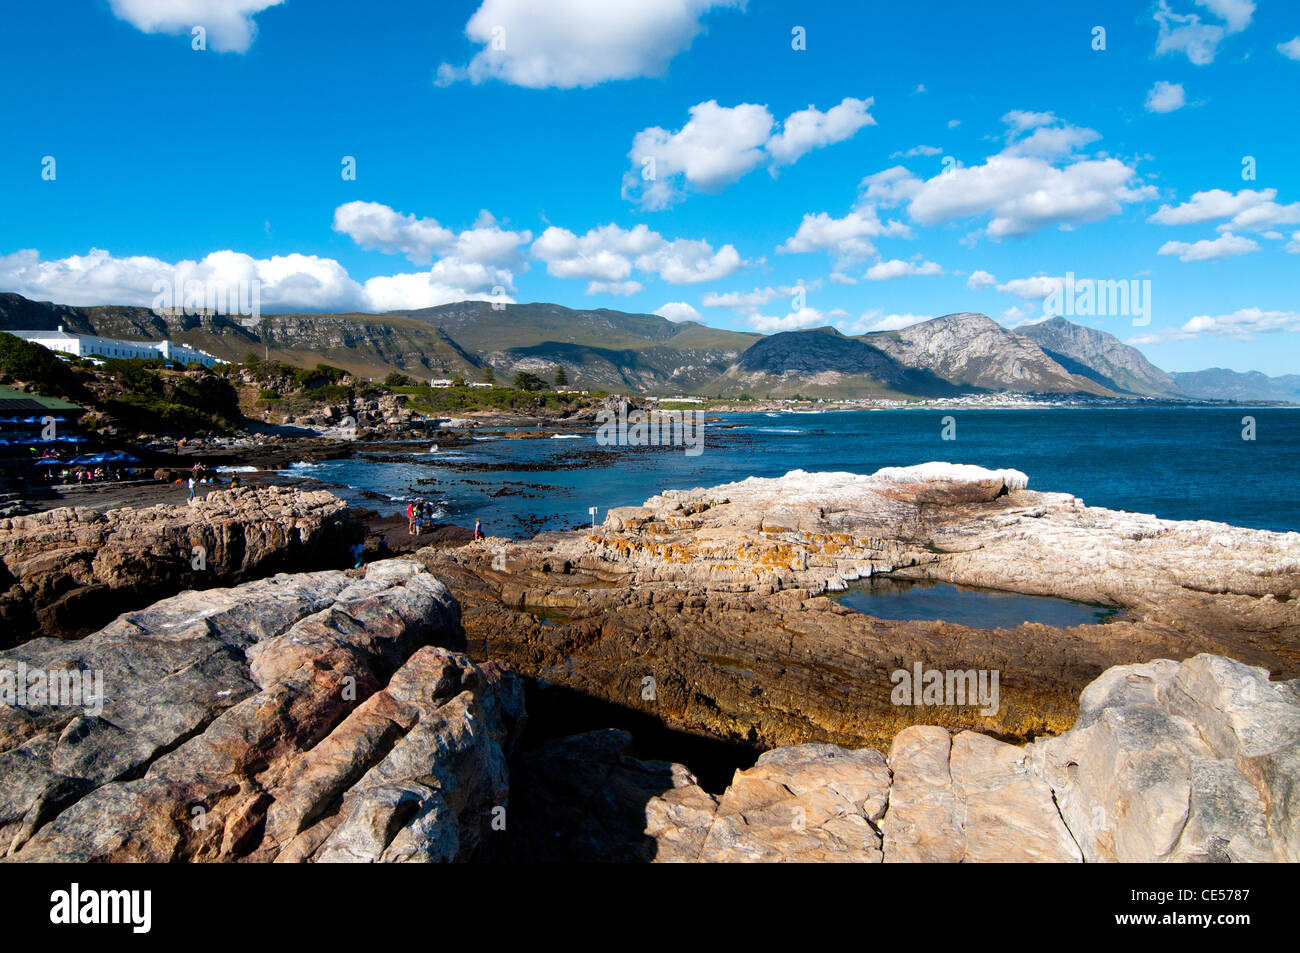 Hermanus coastline, South Africa - Stock Image